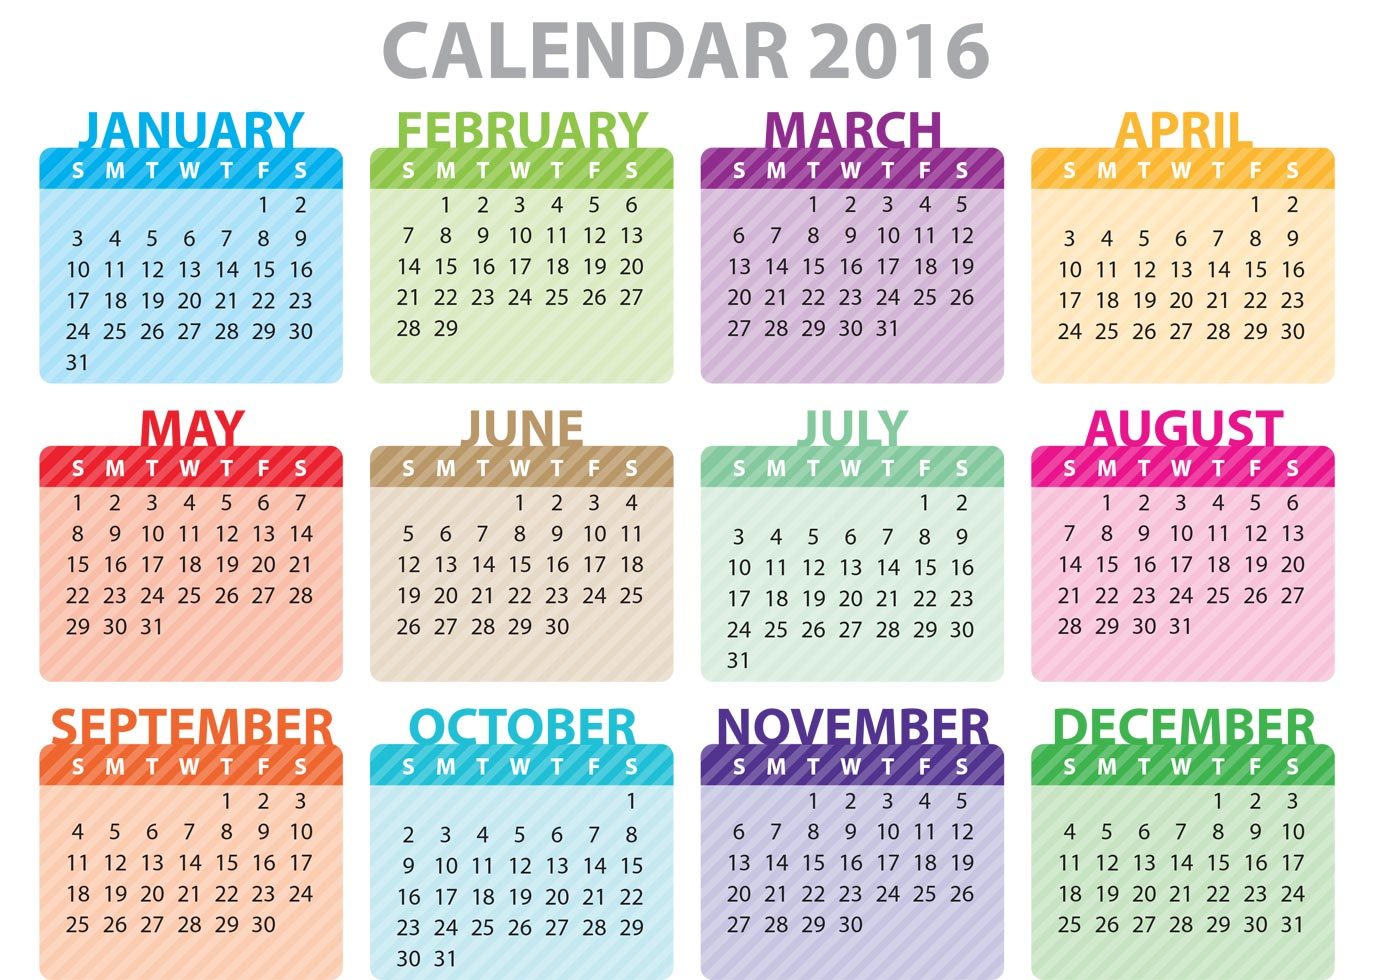 2016 calendar clipart clip transparent library 2016 Calendar Clipart - Clipart Kid clip transparent library